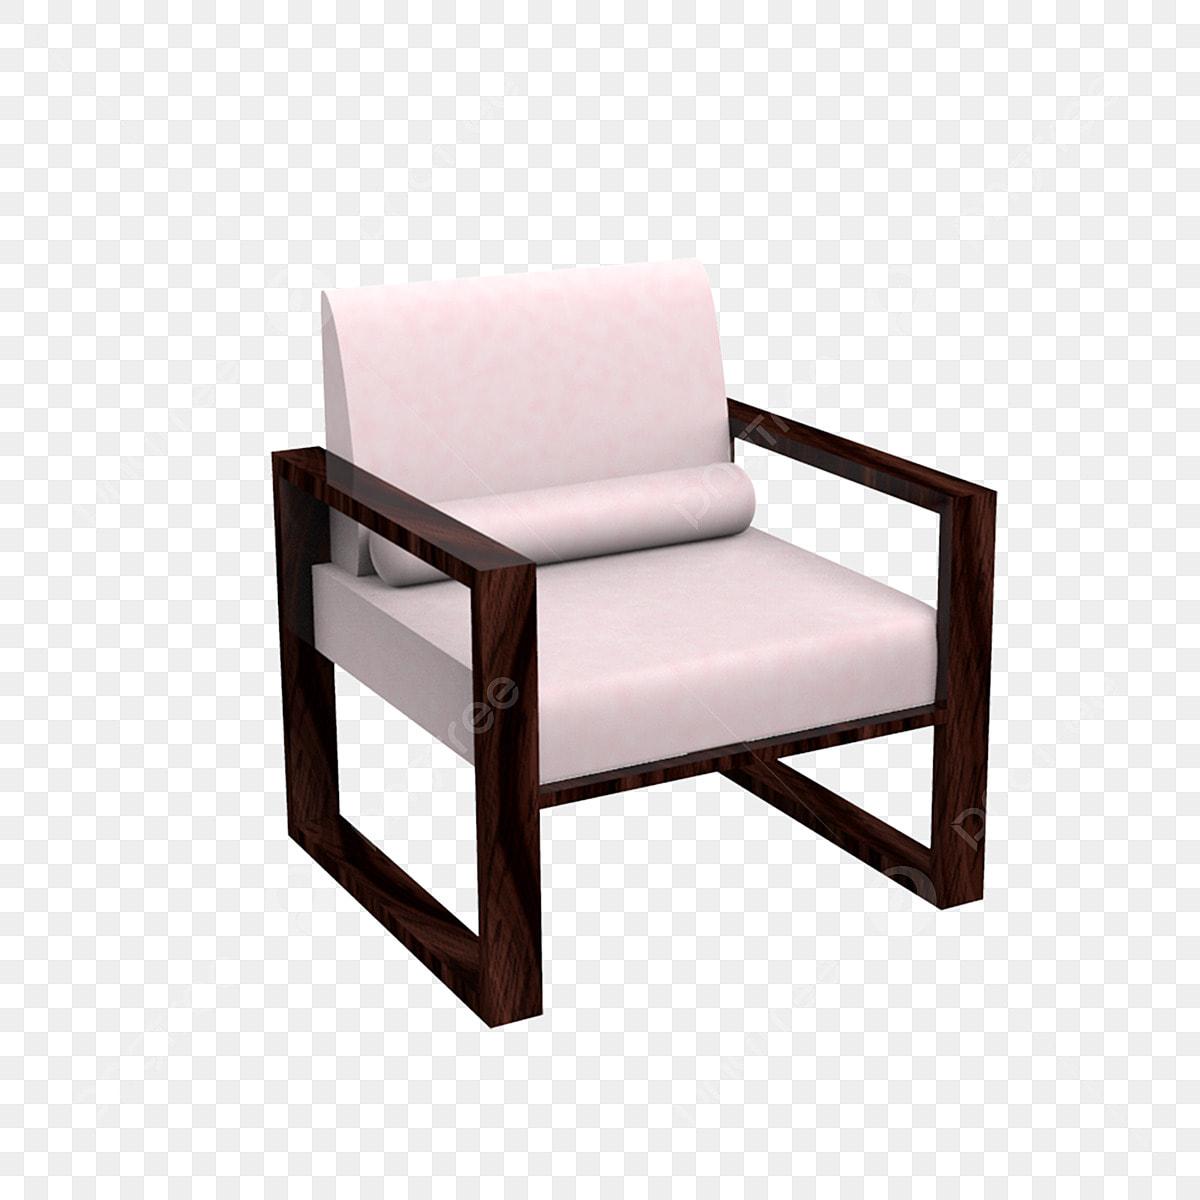 Simulation Sofa Chair Free Material Furniture Chairs Sofa